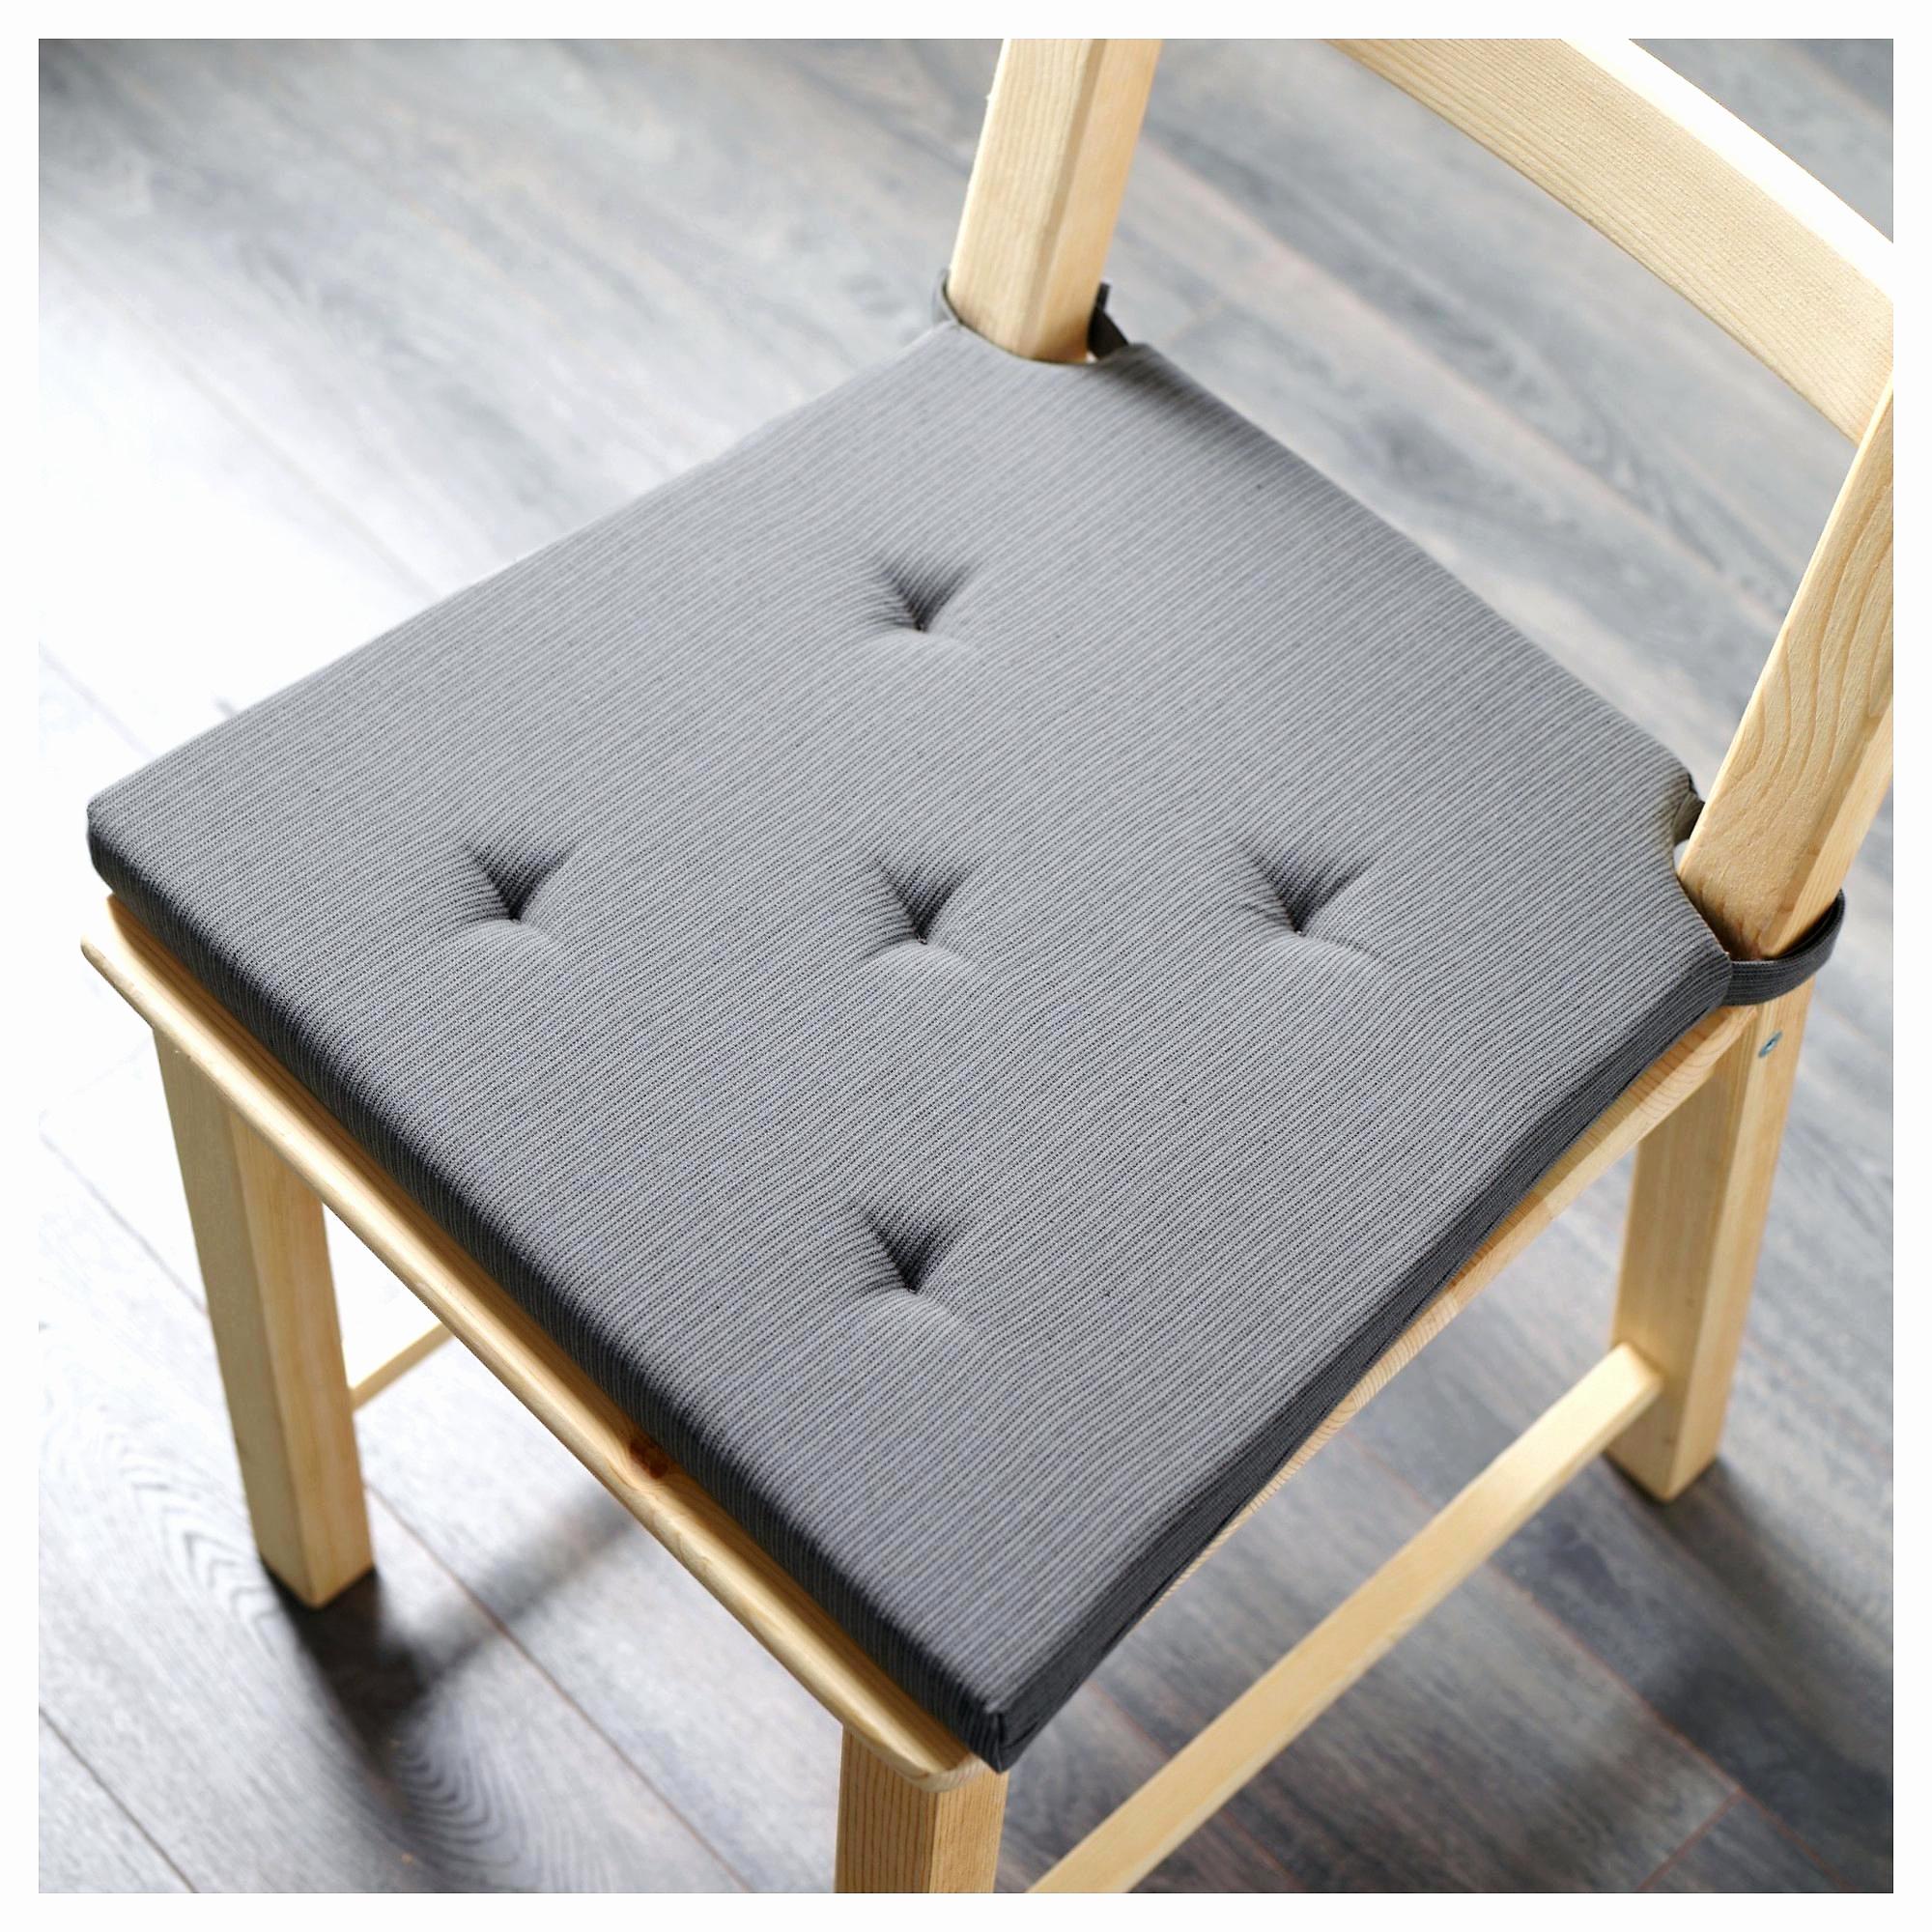 Chaise Hesperide Pas Cher Luxe Nouveau Galette Chaise Ikea Luckytroll